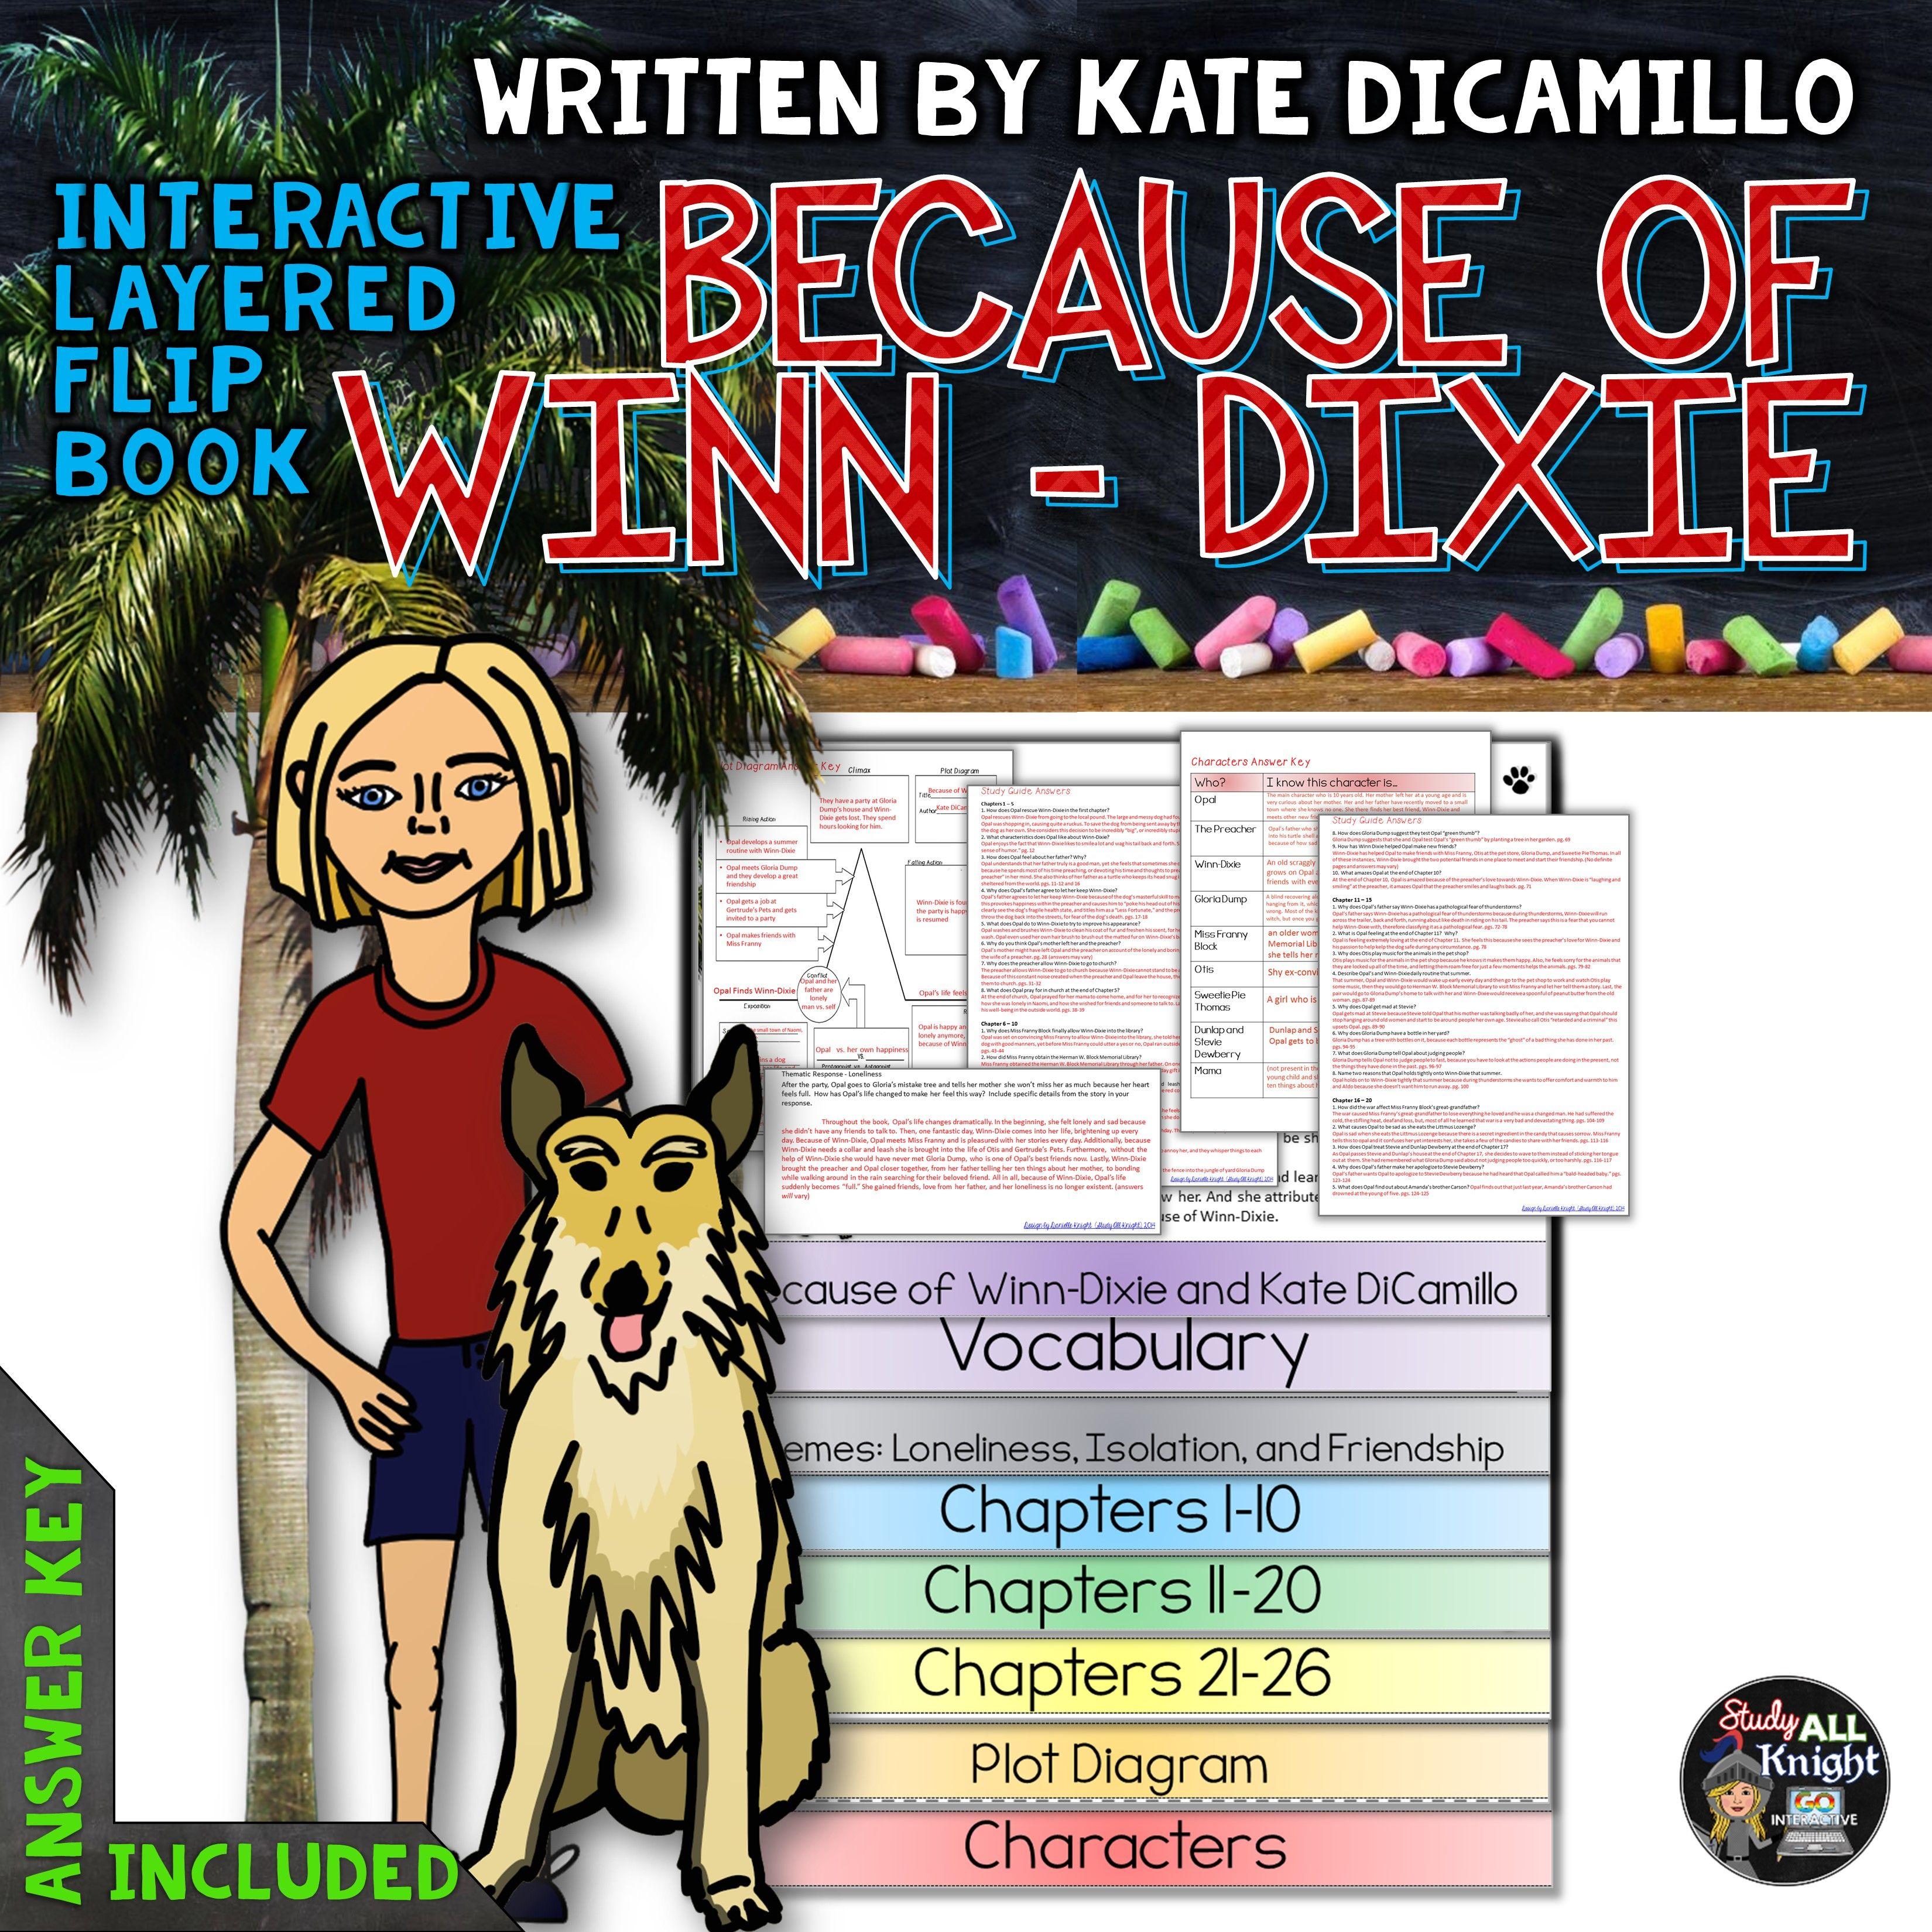 BECAUSE OF WINN-DIXIE: INTERACTIVE LAYERED FLIP BOOK LITERATURE GUIDE ($)